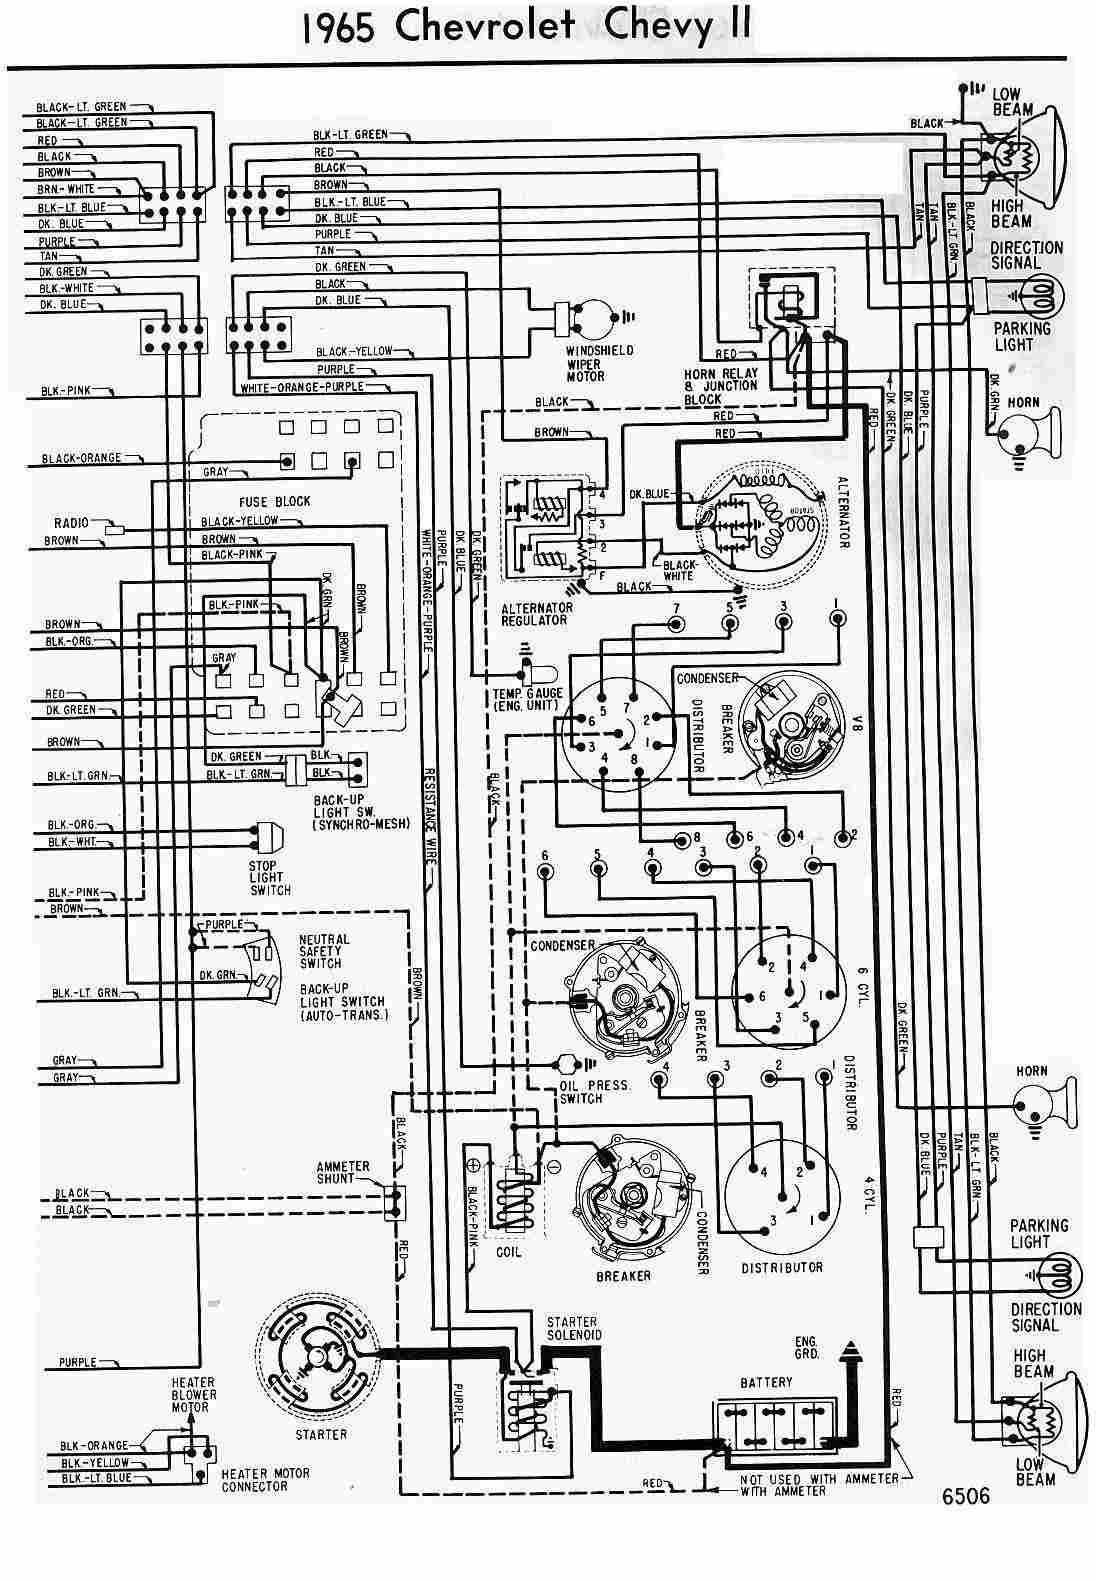 small resolution of 66 impala ss wiring diagram wiring diagrams66 impala ss wiring diagram wiring library 1964 impala tail